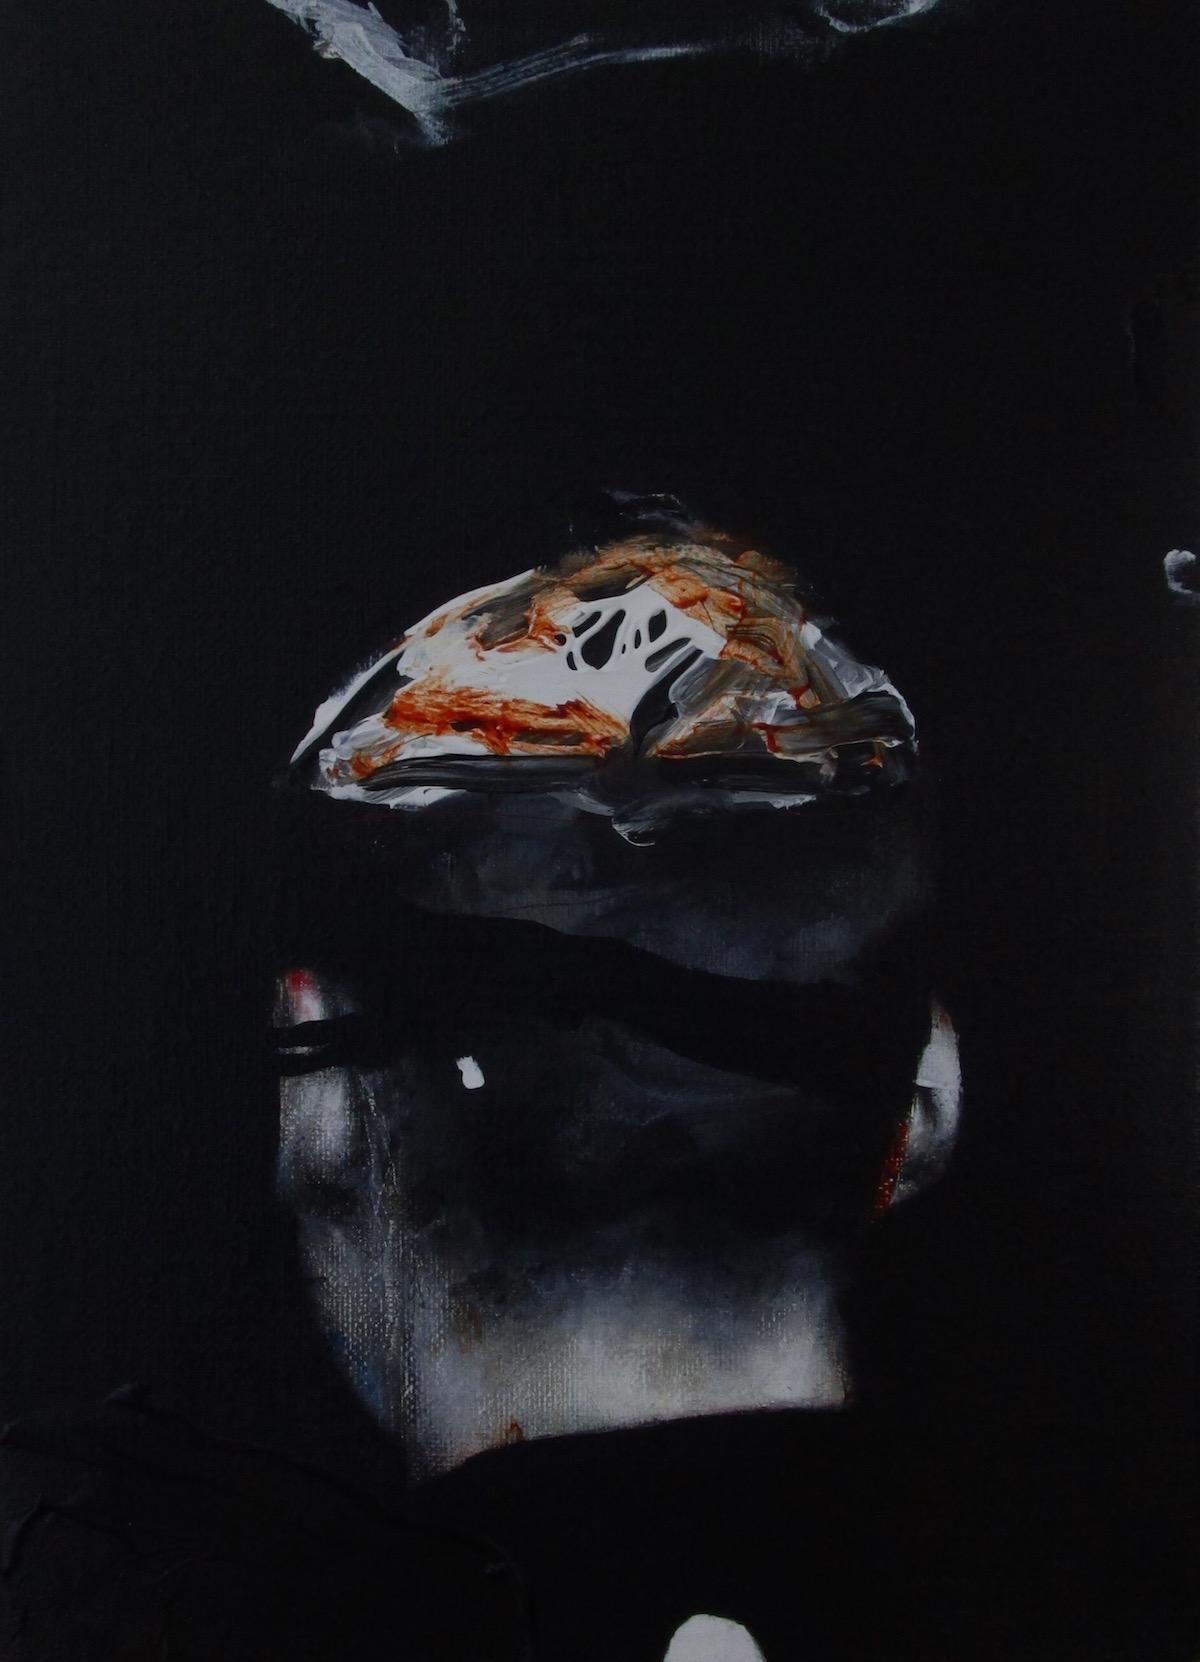 Antoine Cordet canvas toile peinture painting portrait art artist artiste peintre acrylic acapulco